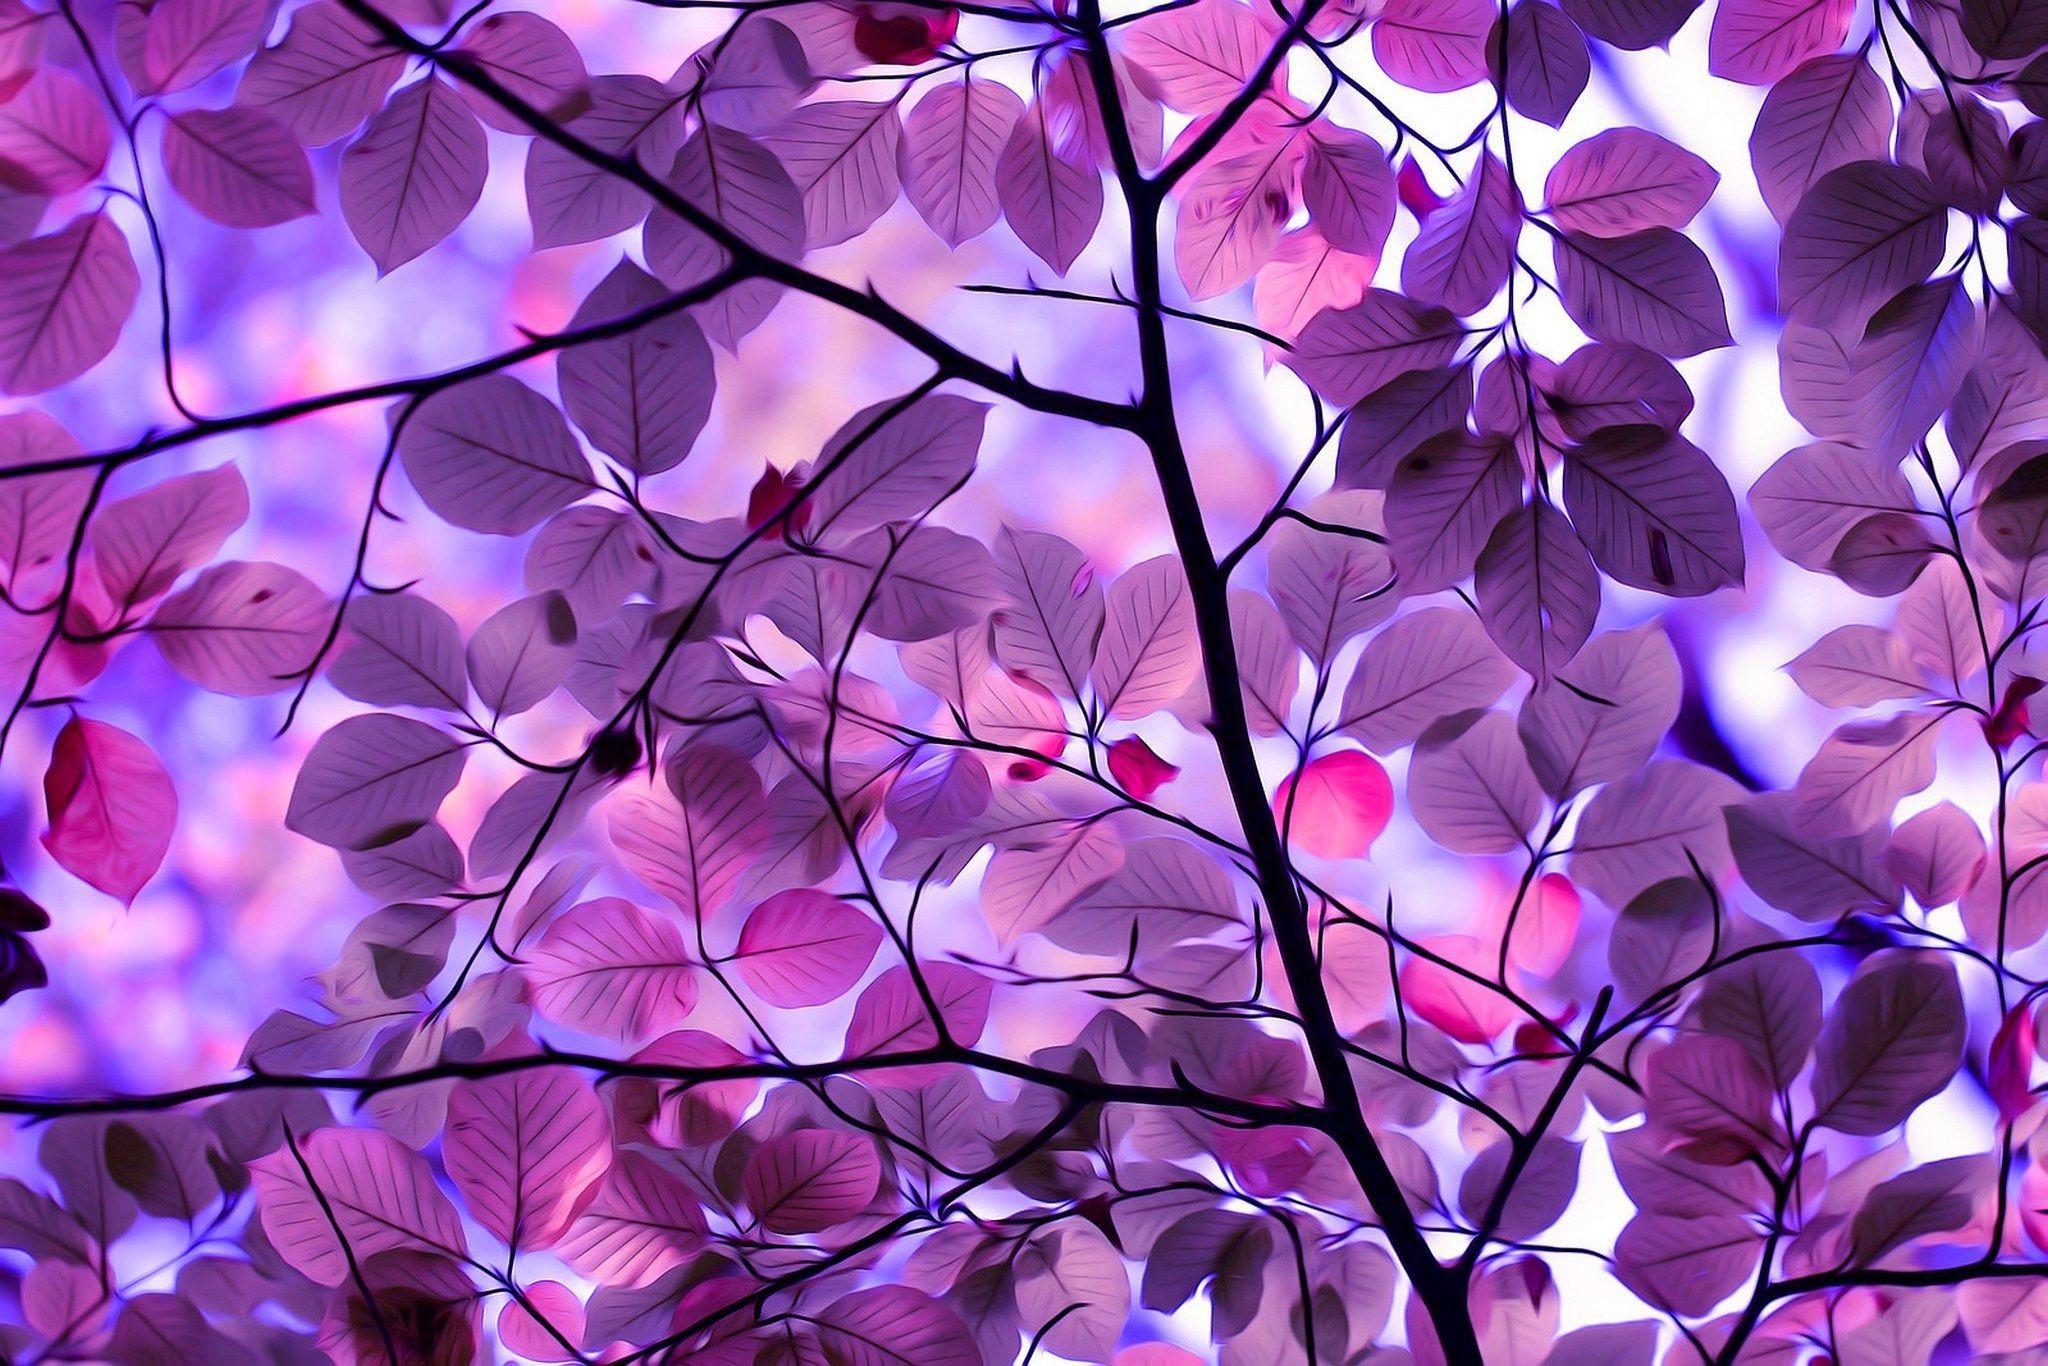 Res: 2048x1366, Purple-Leaves-Wallpaper-Free